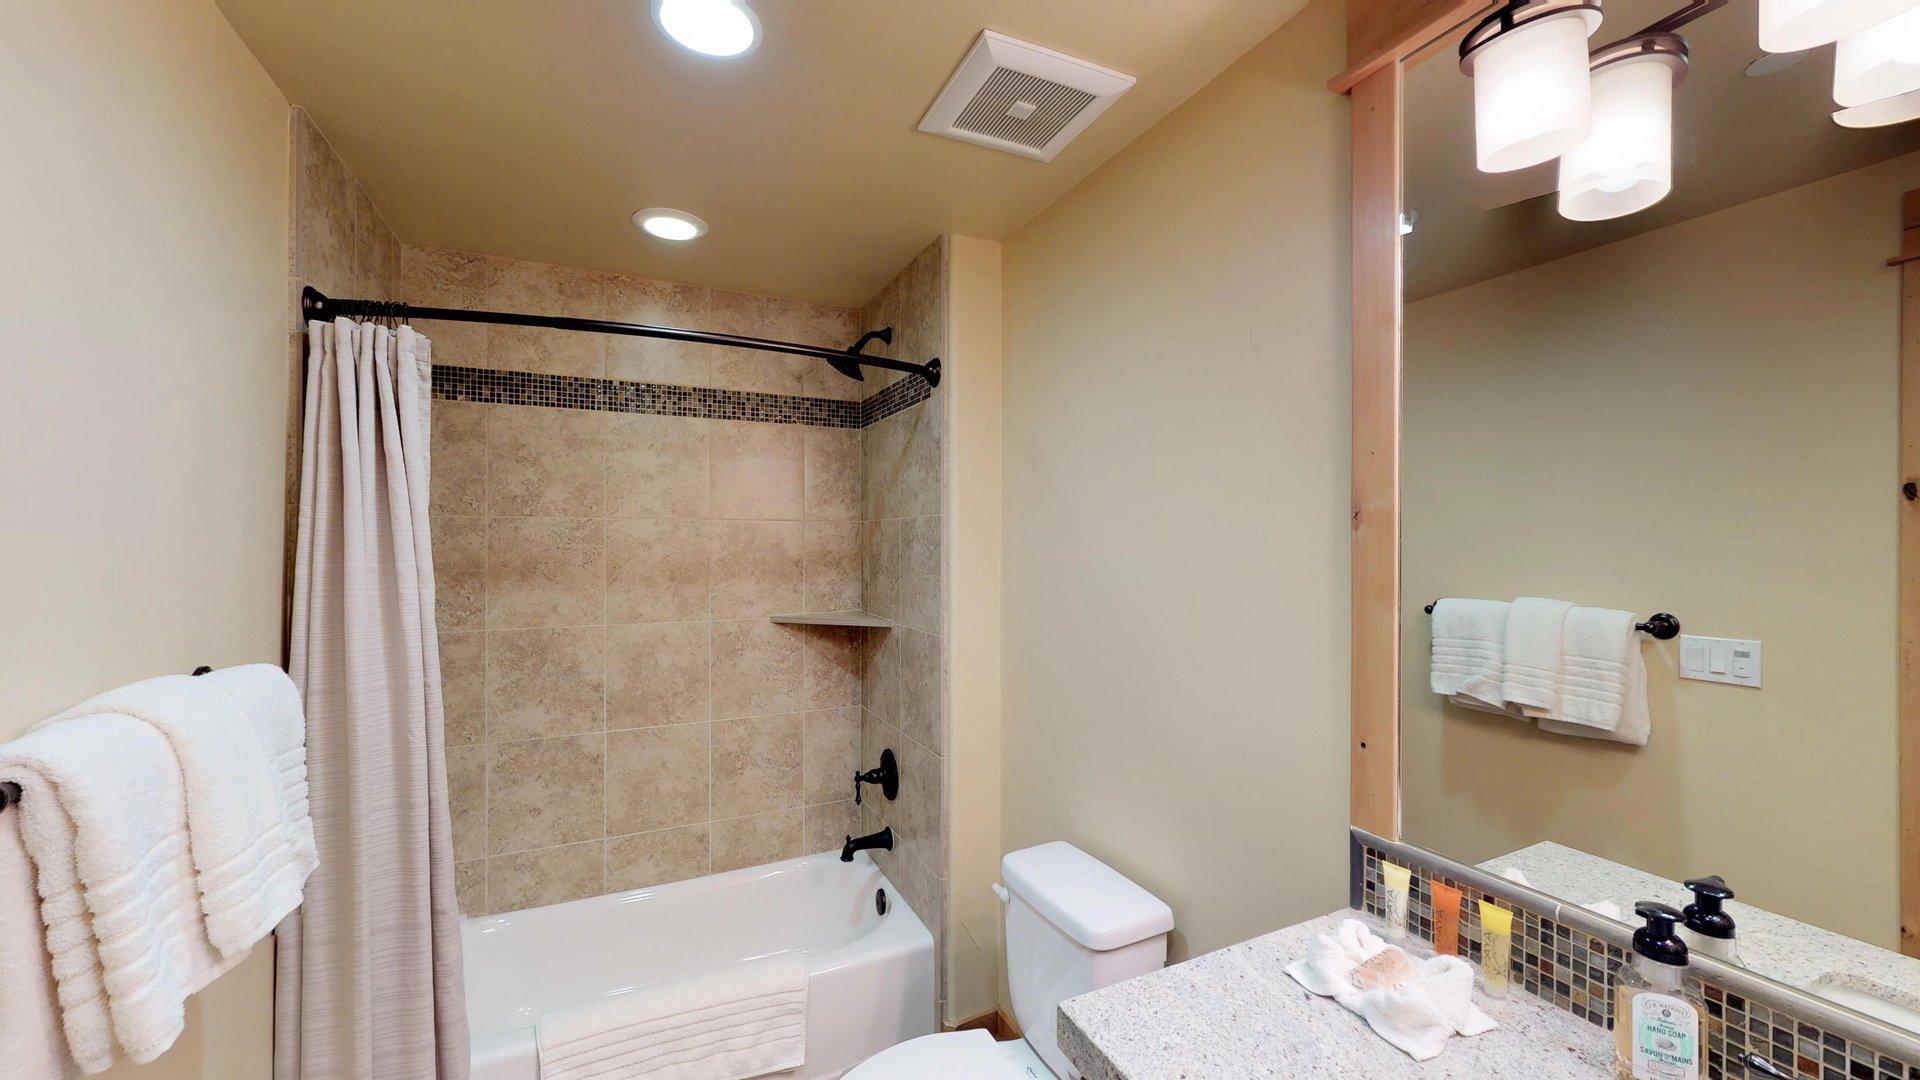 Bathroom in Vacation Rental in Truckee CA Features Bathtub.